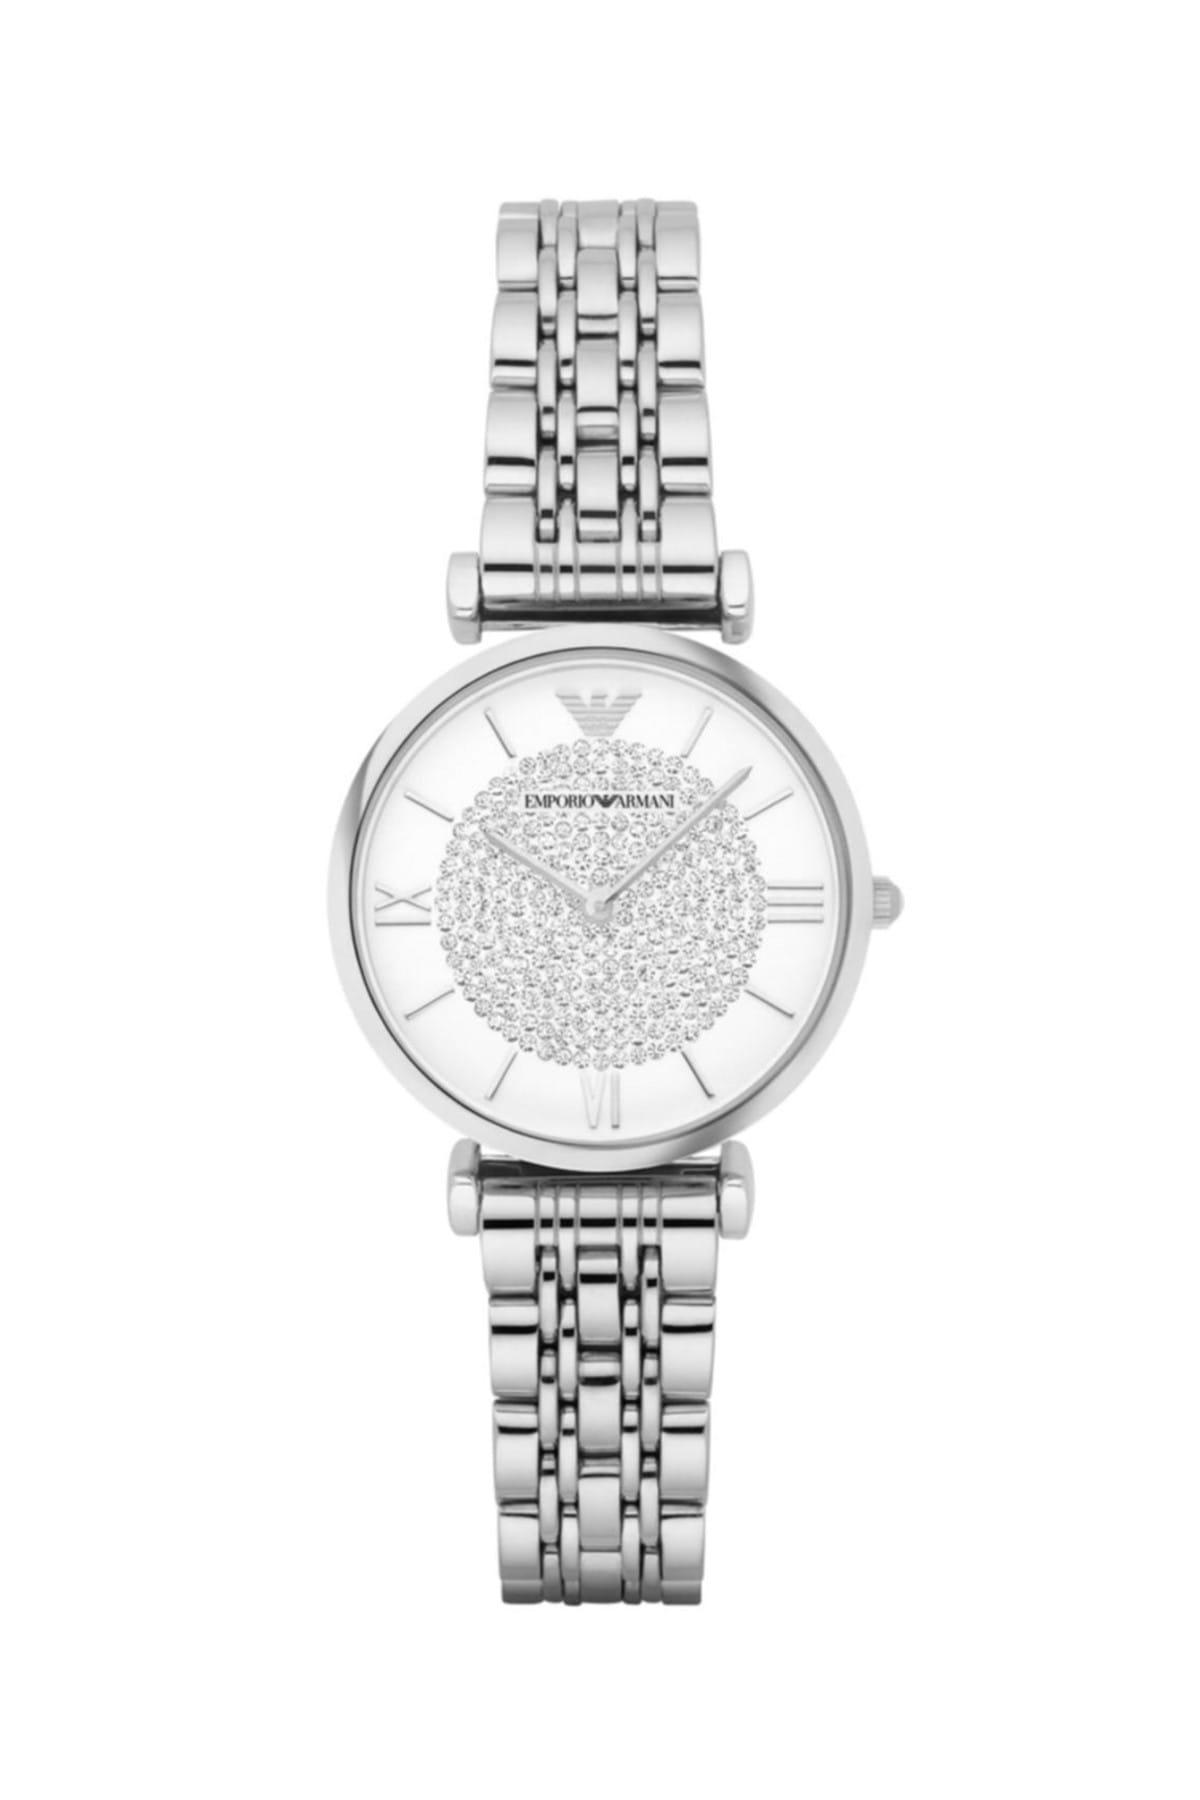 Emporio Armani Kadın Kol Saati AR1925 1